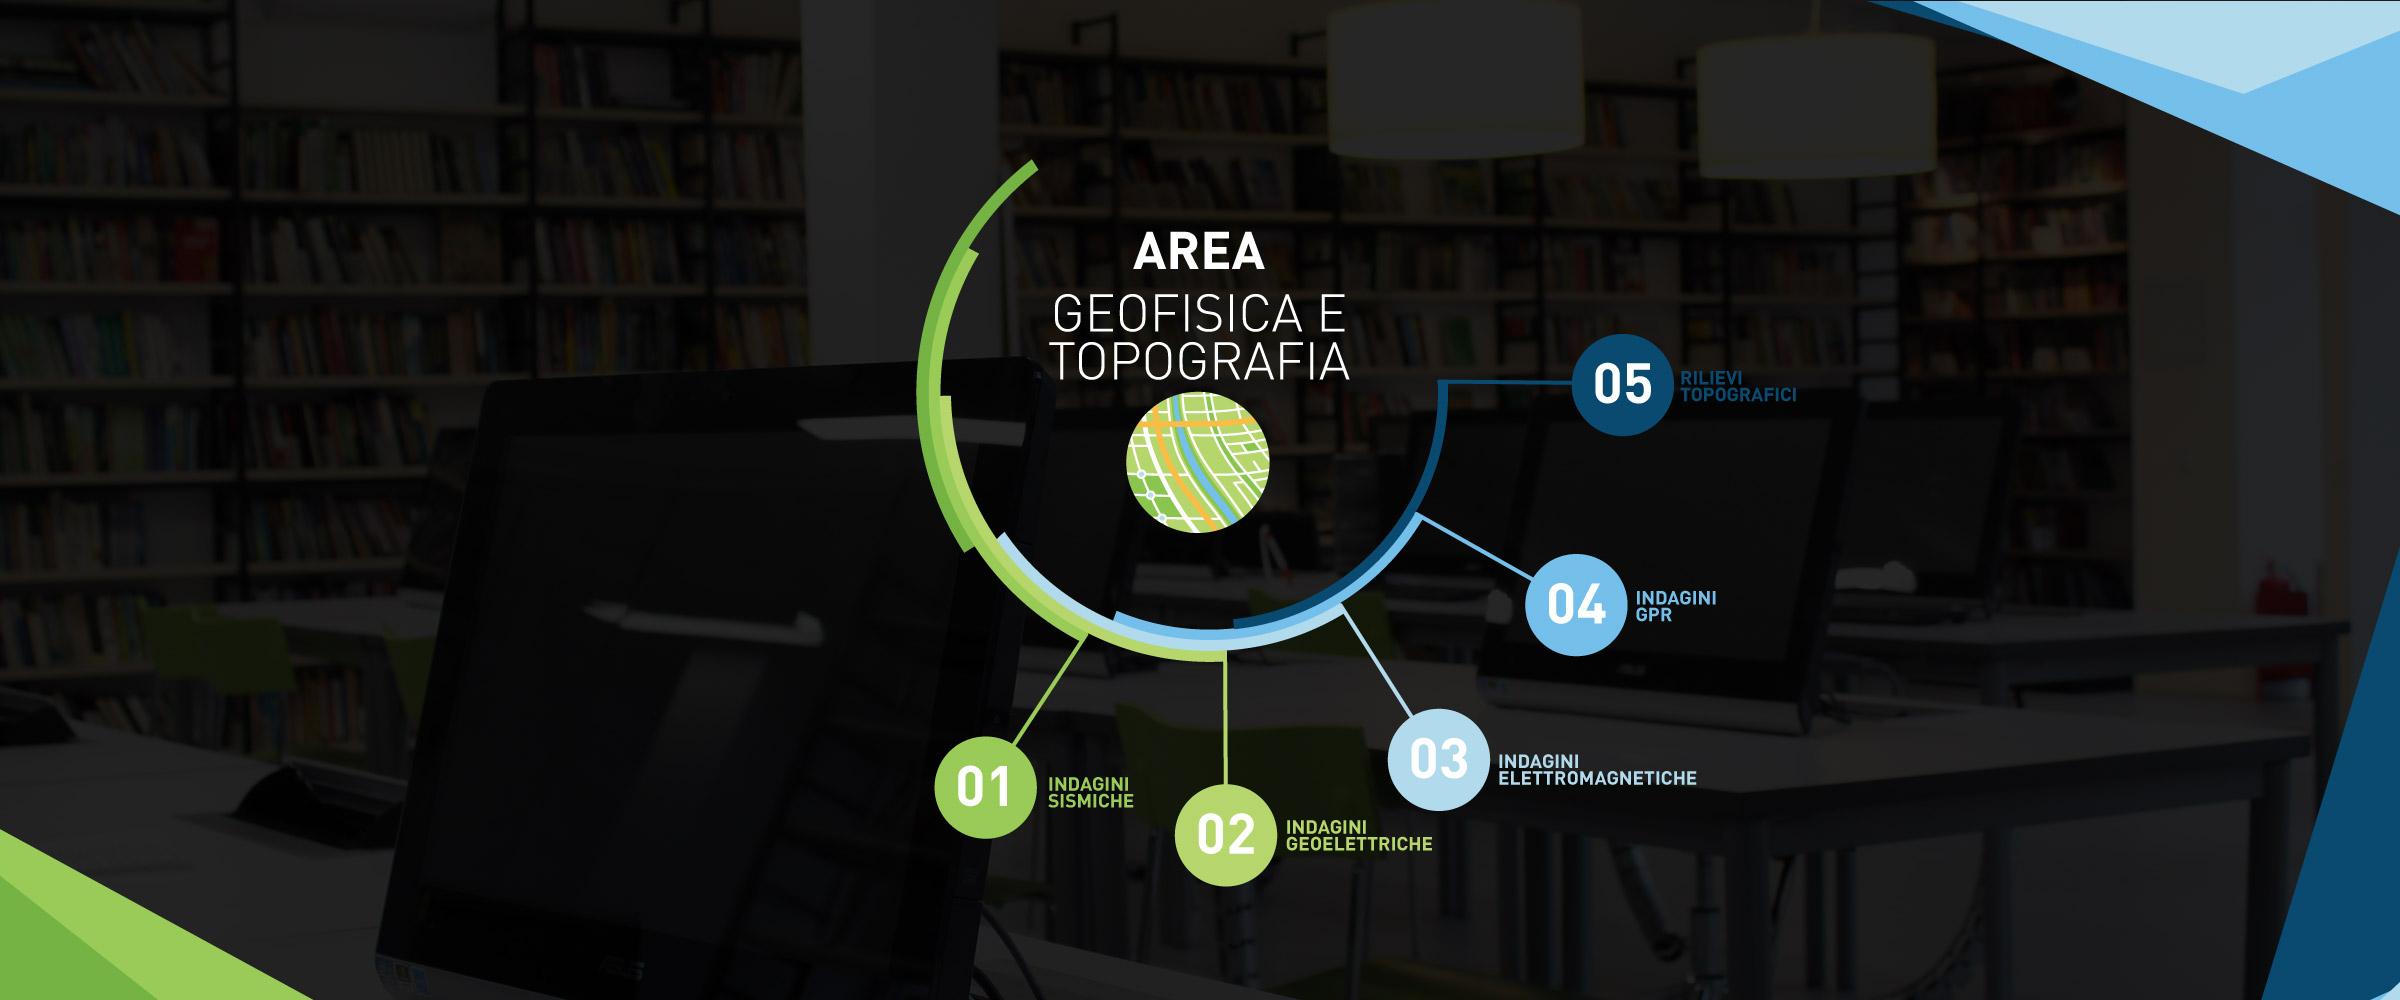 Area Geofisica